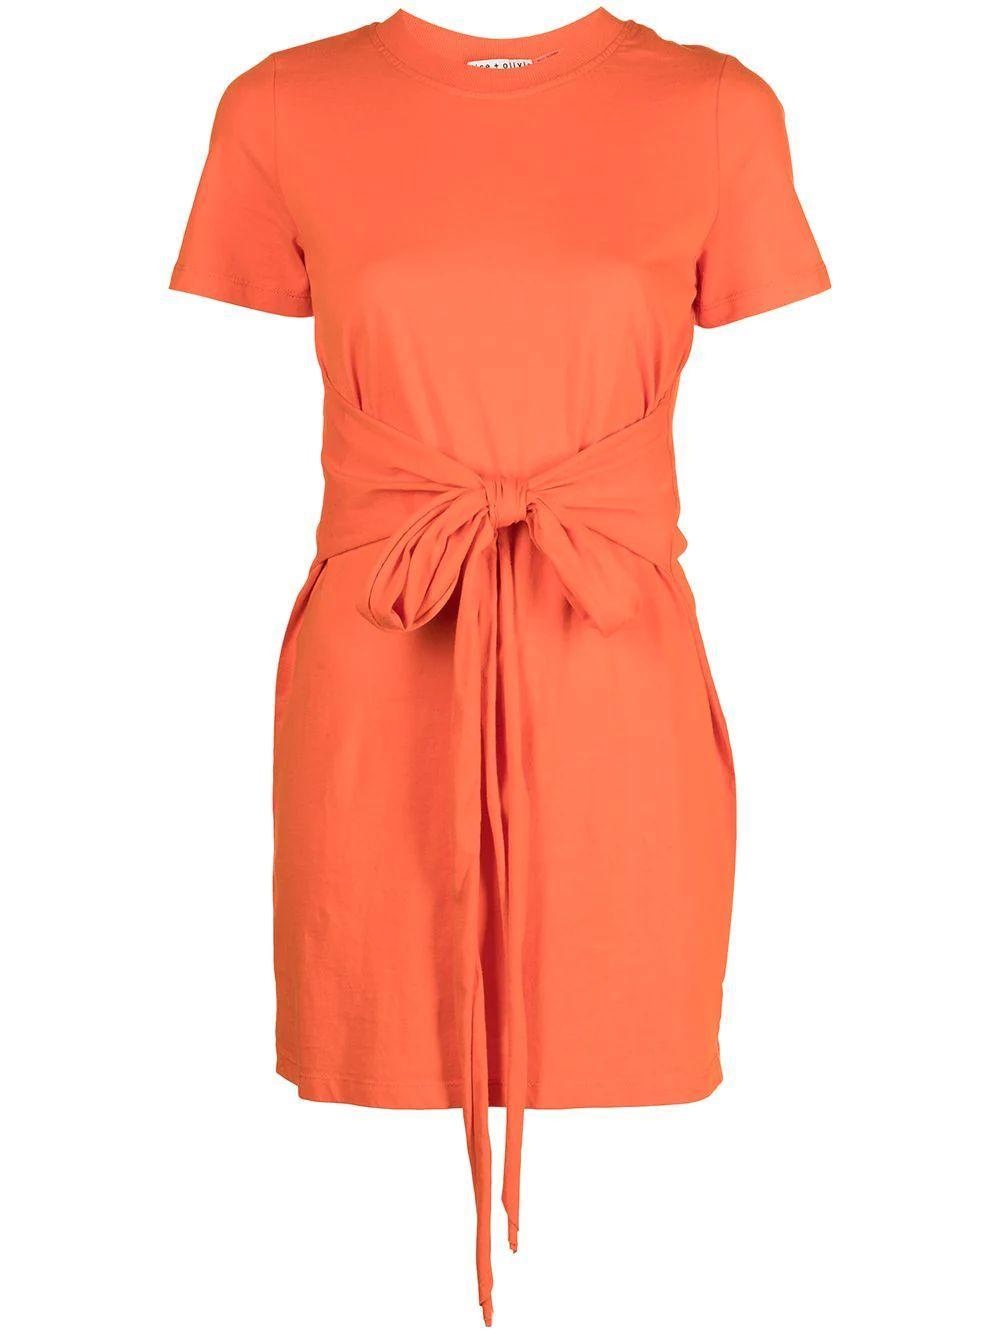 Evie T- Shirt Dress Item # CC105W83501